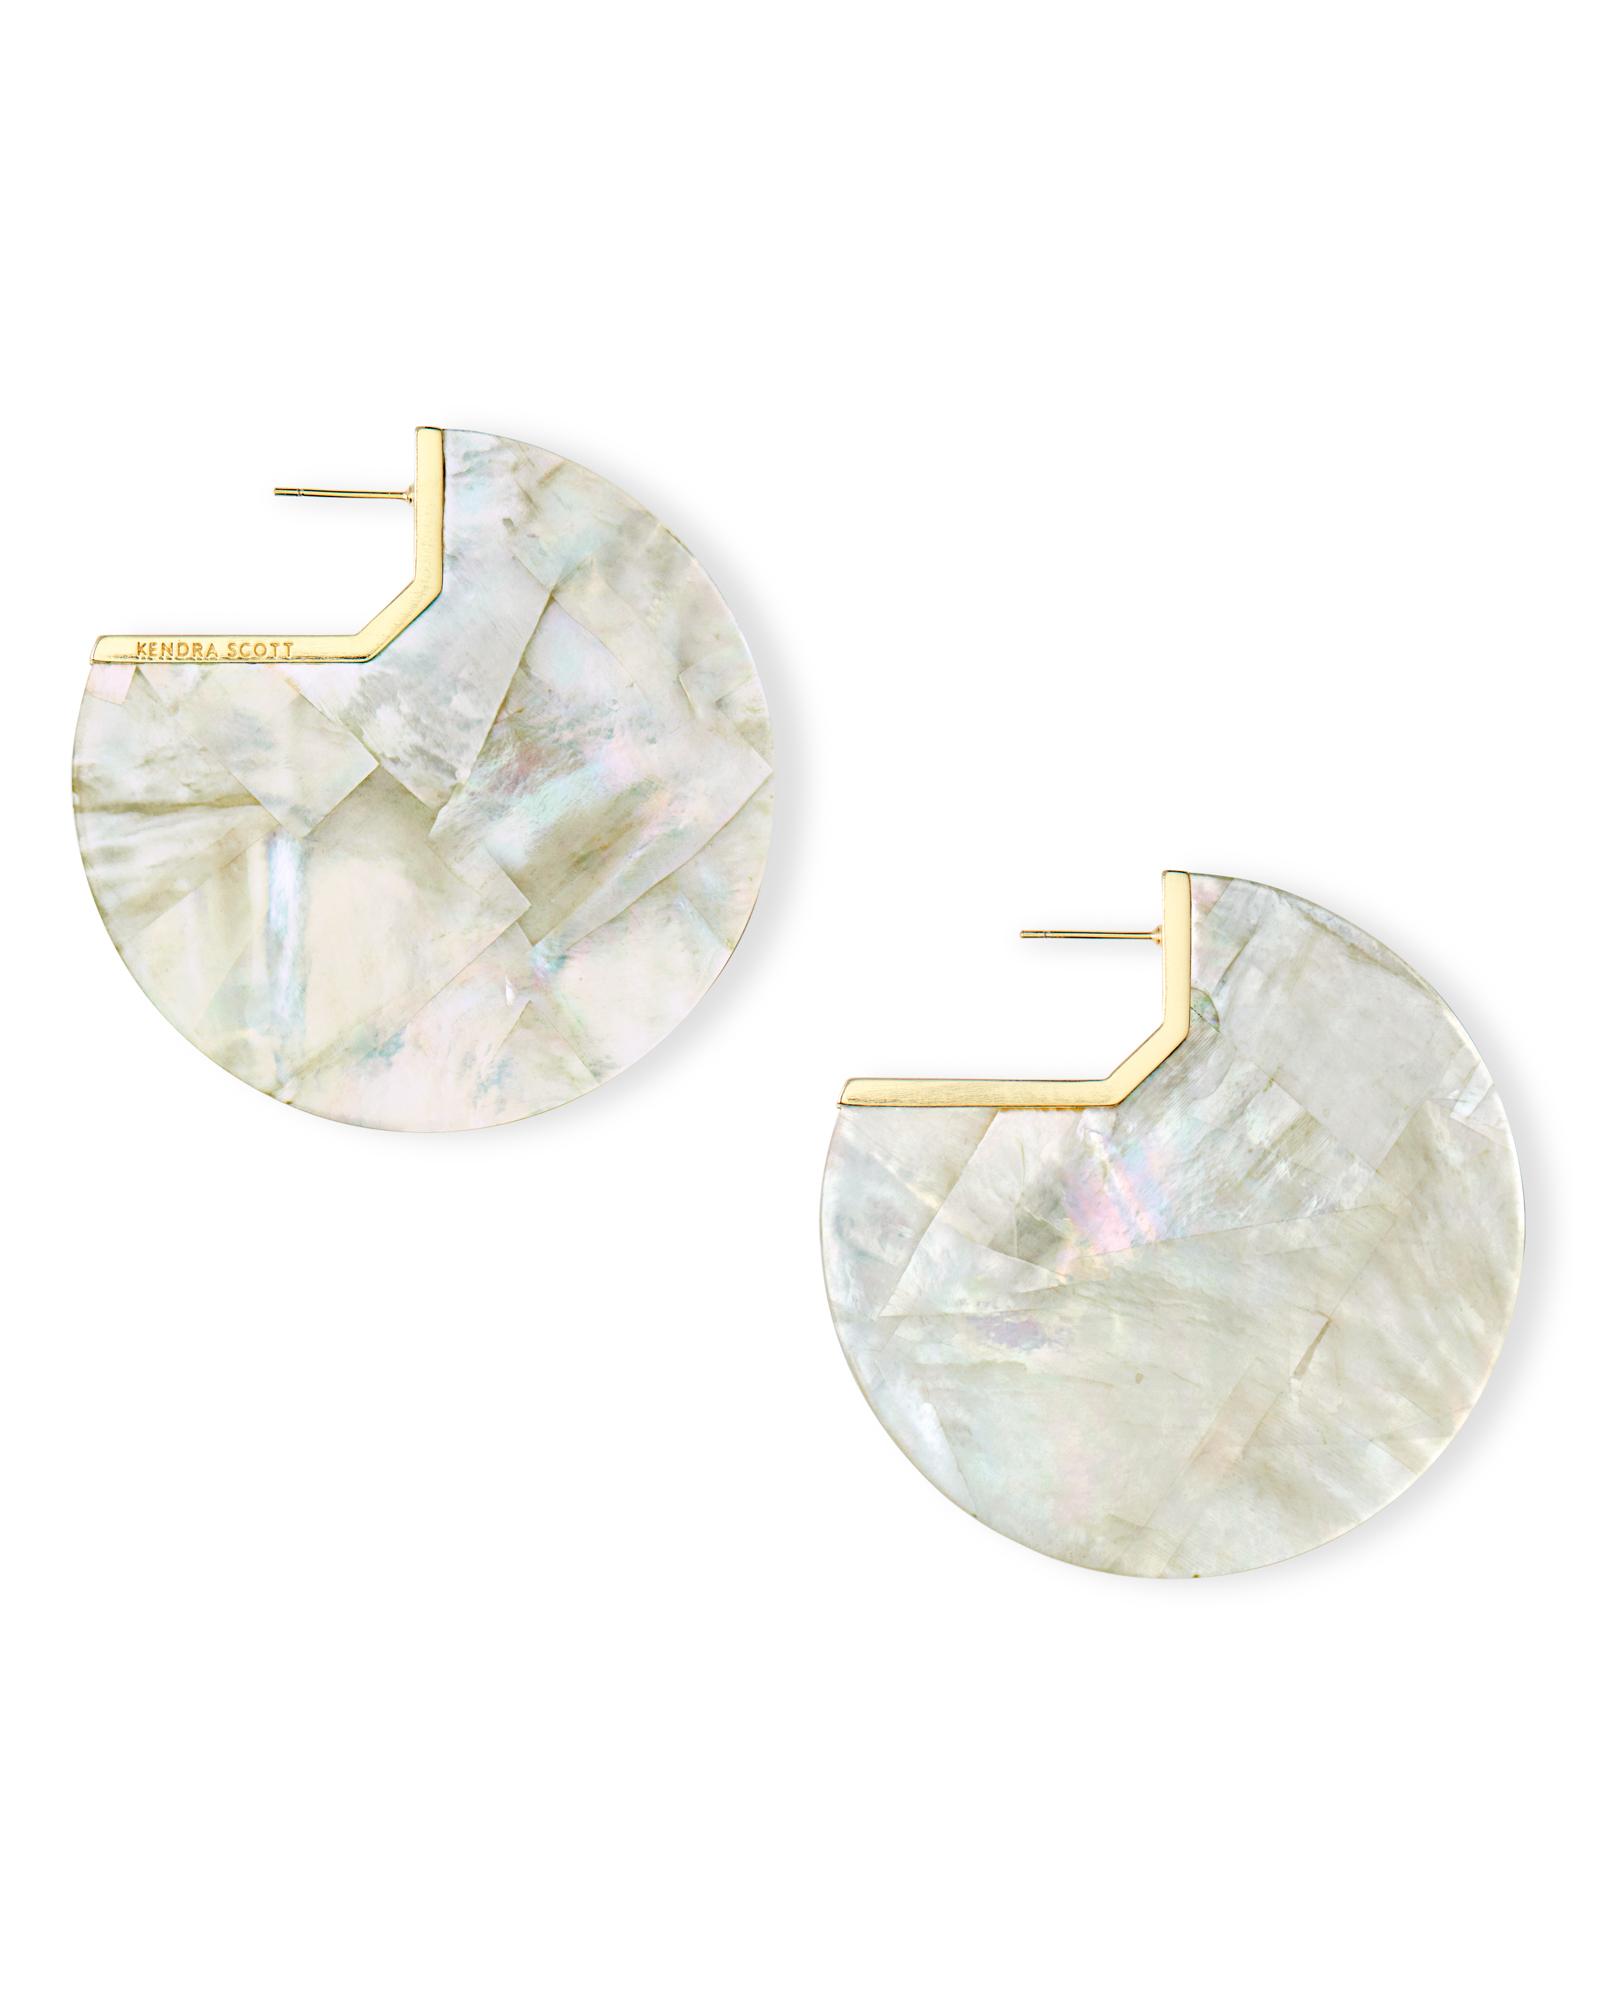 41bd8319db20b Kai Gold Hoop Earrings in Ivory Pearl | Kendra Scott